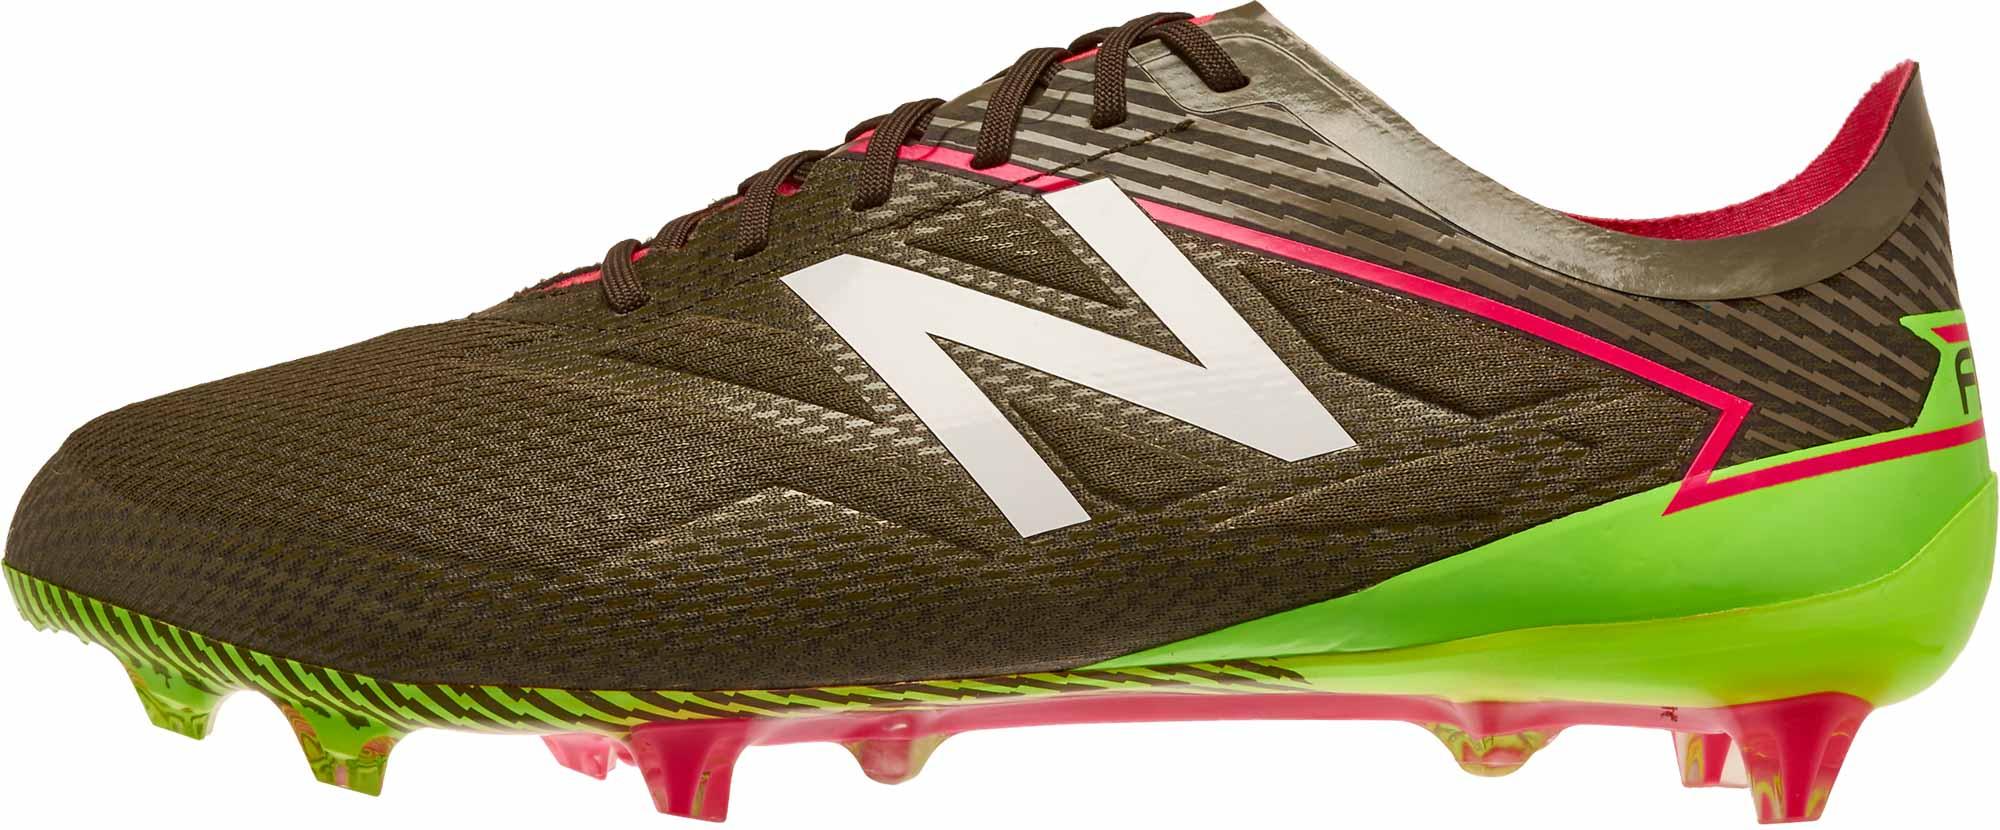 New Balance Furon 3.0 Pro FG Soccer Cleats - Military Dark Triumph & Alpha Pink